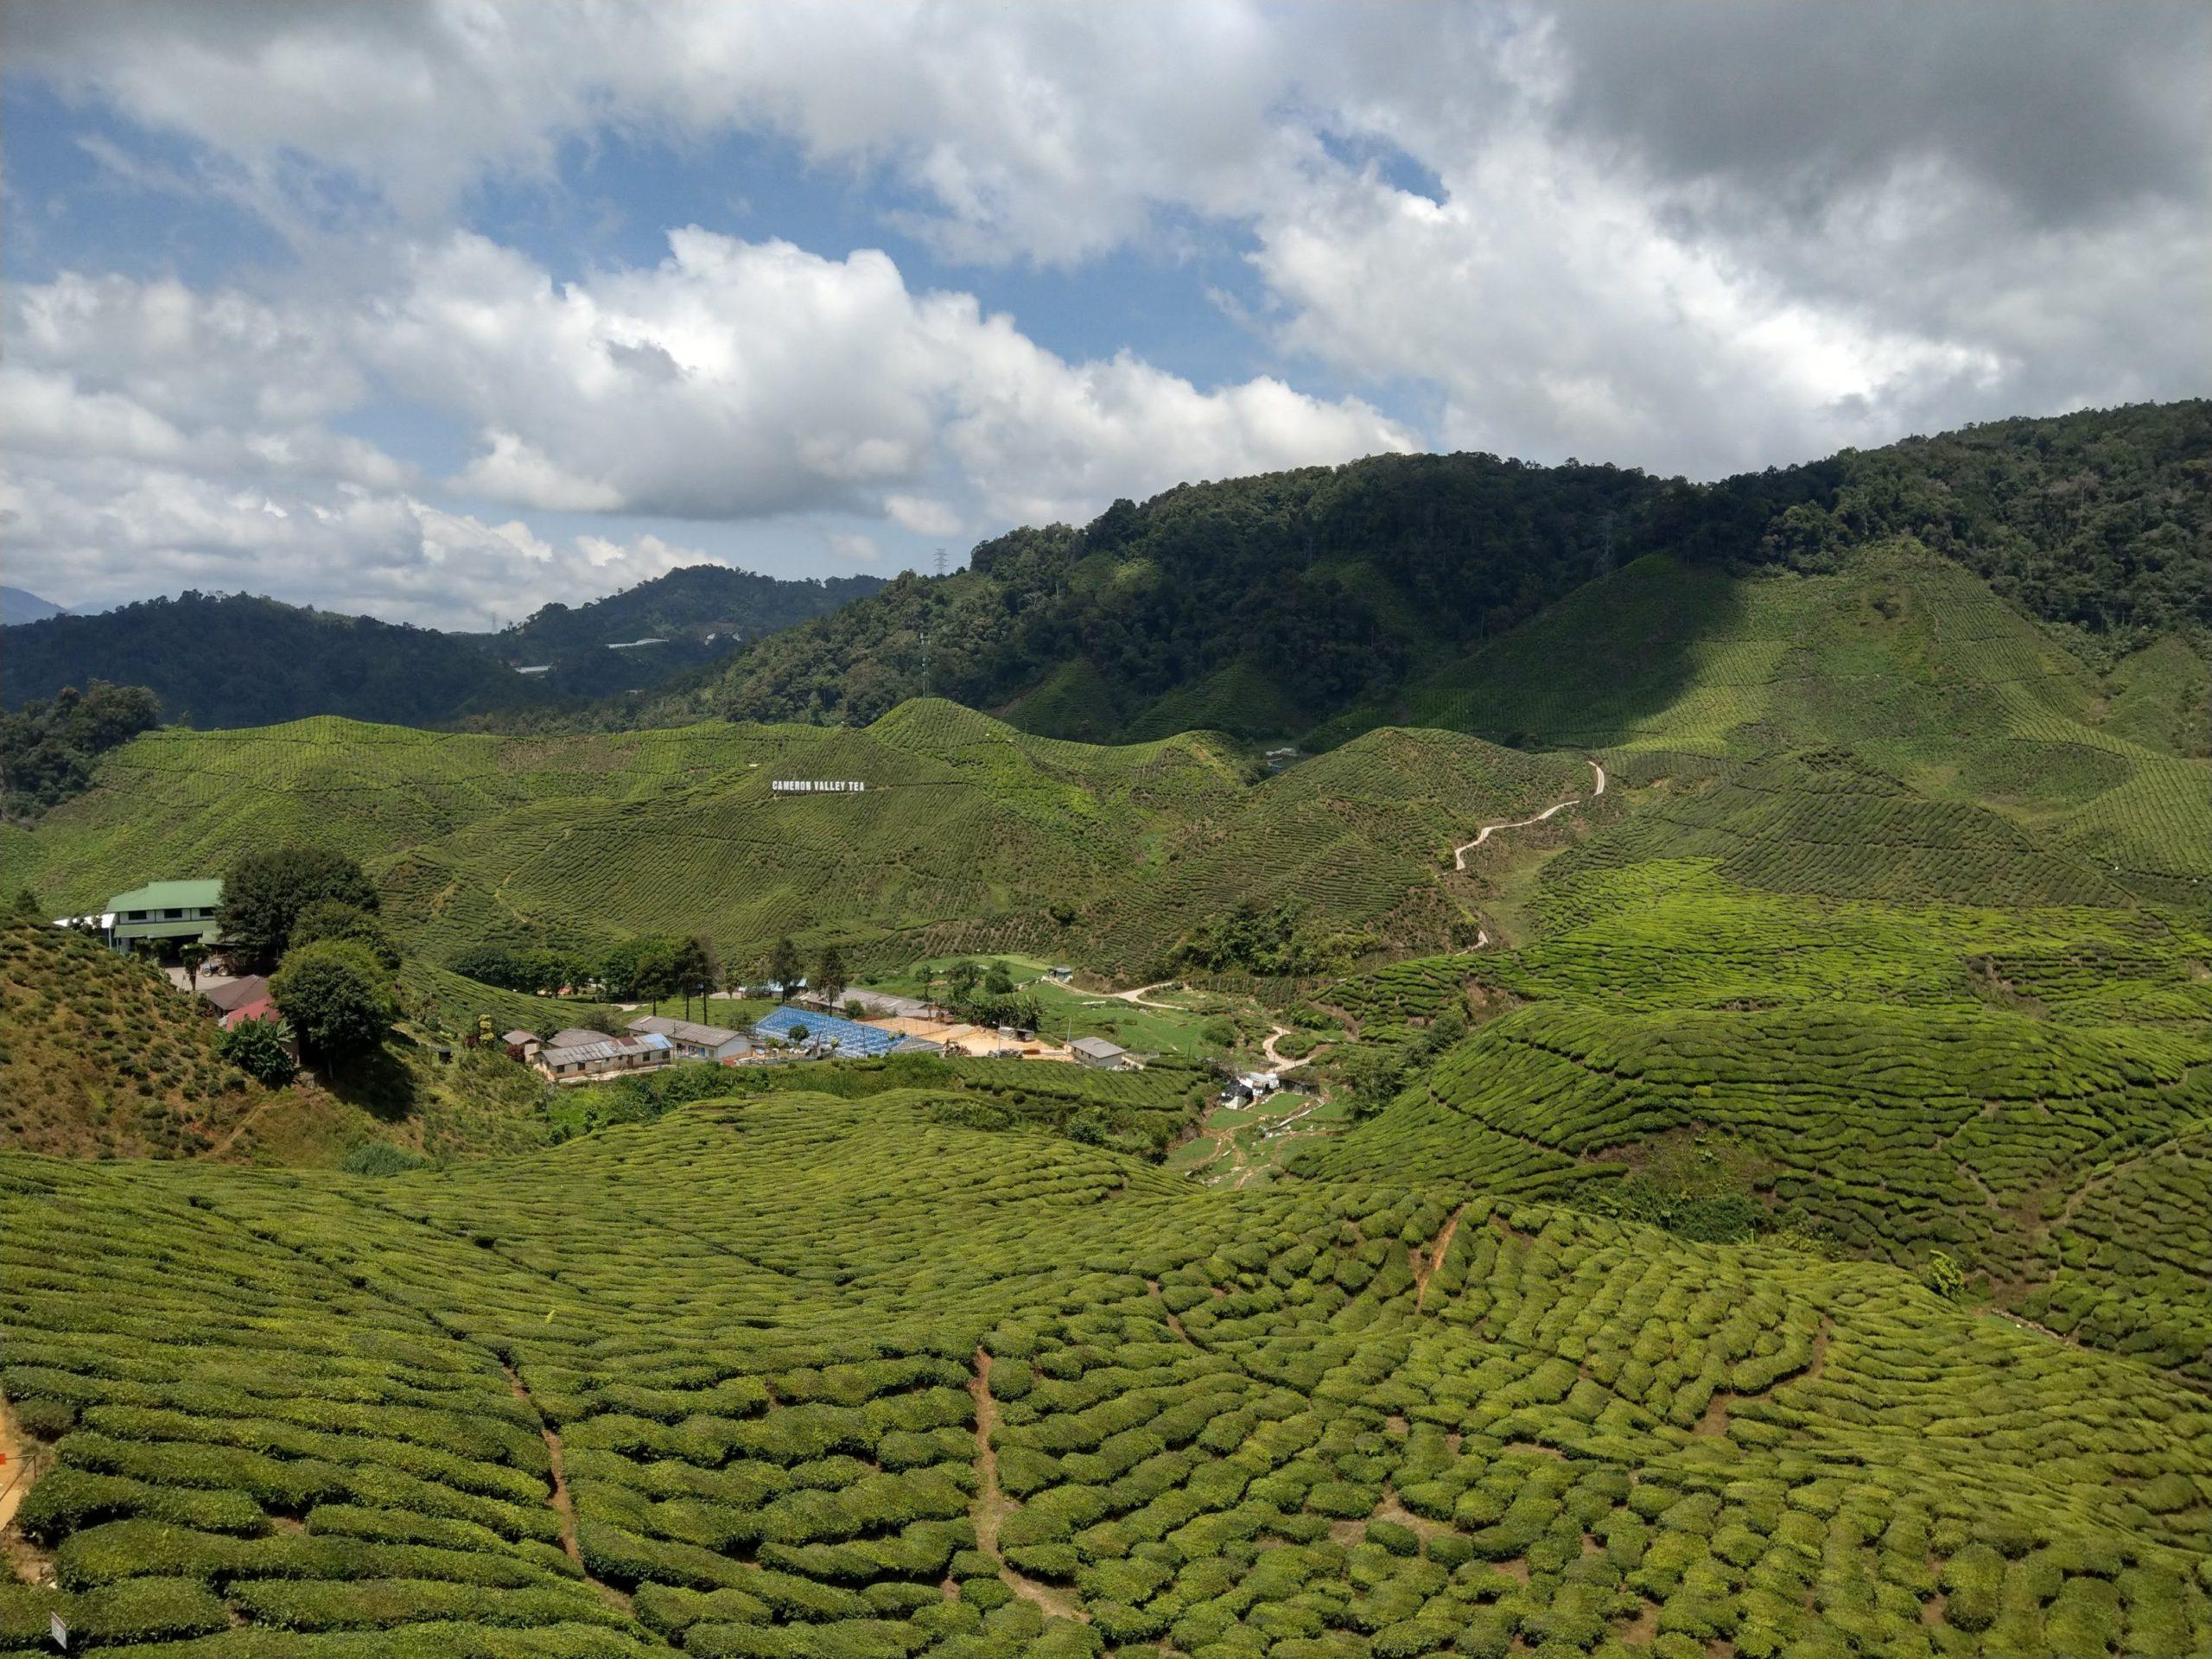 IMAG2080 scaled - مرتفعات الكاميرون جنة خضراء